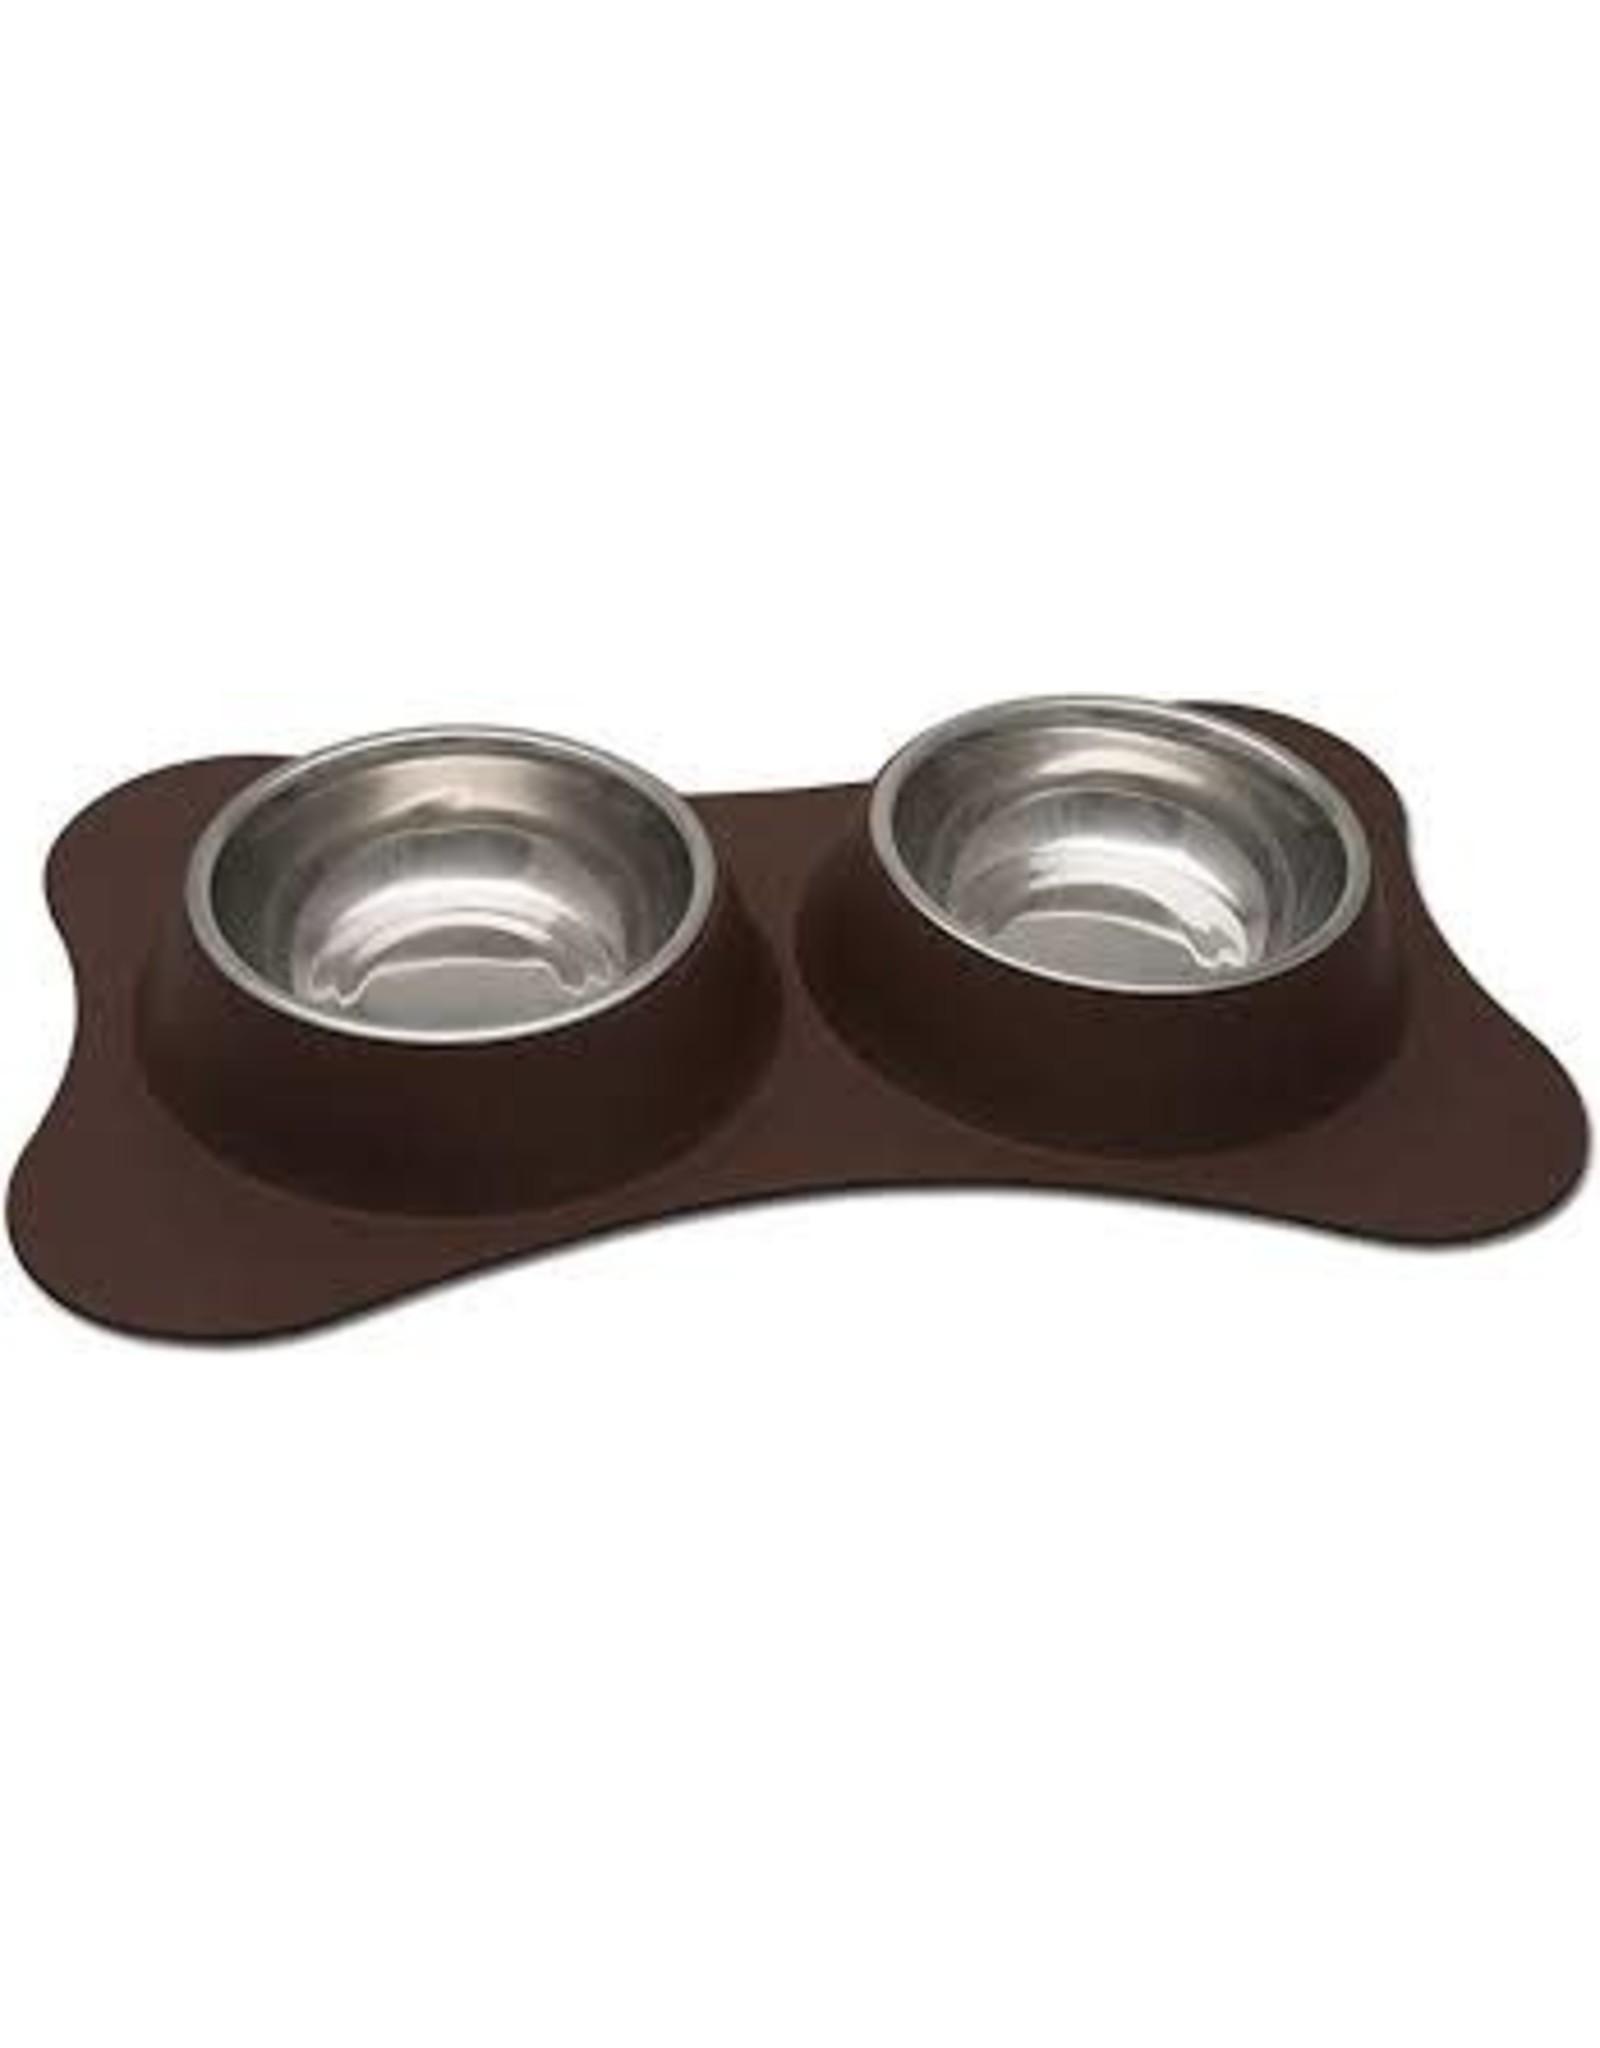 Dolce Flex Dolce Flex - Dinner Bowls Small